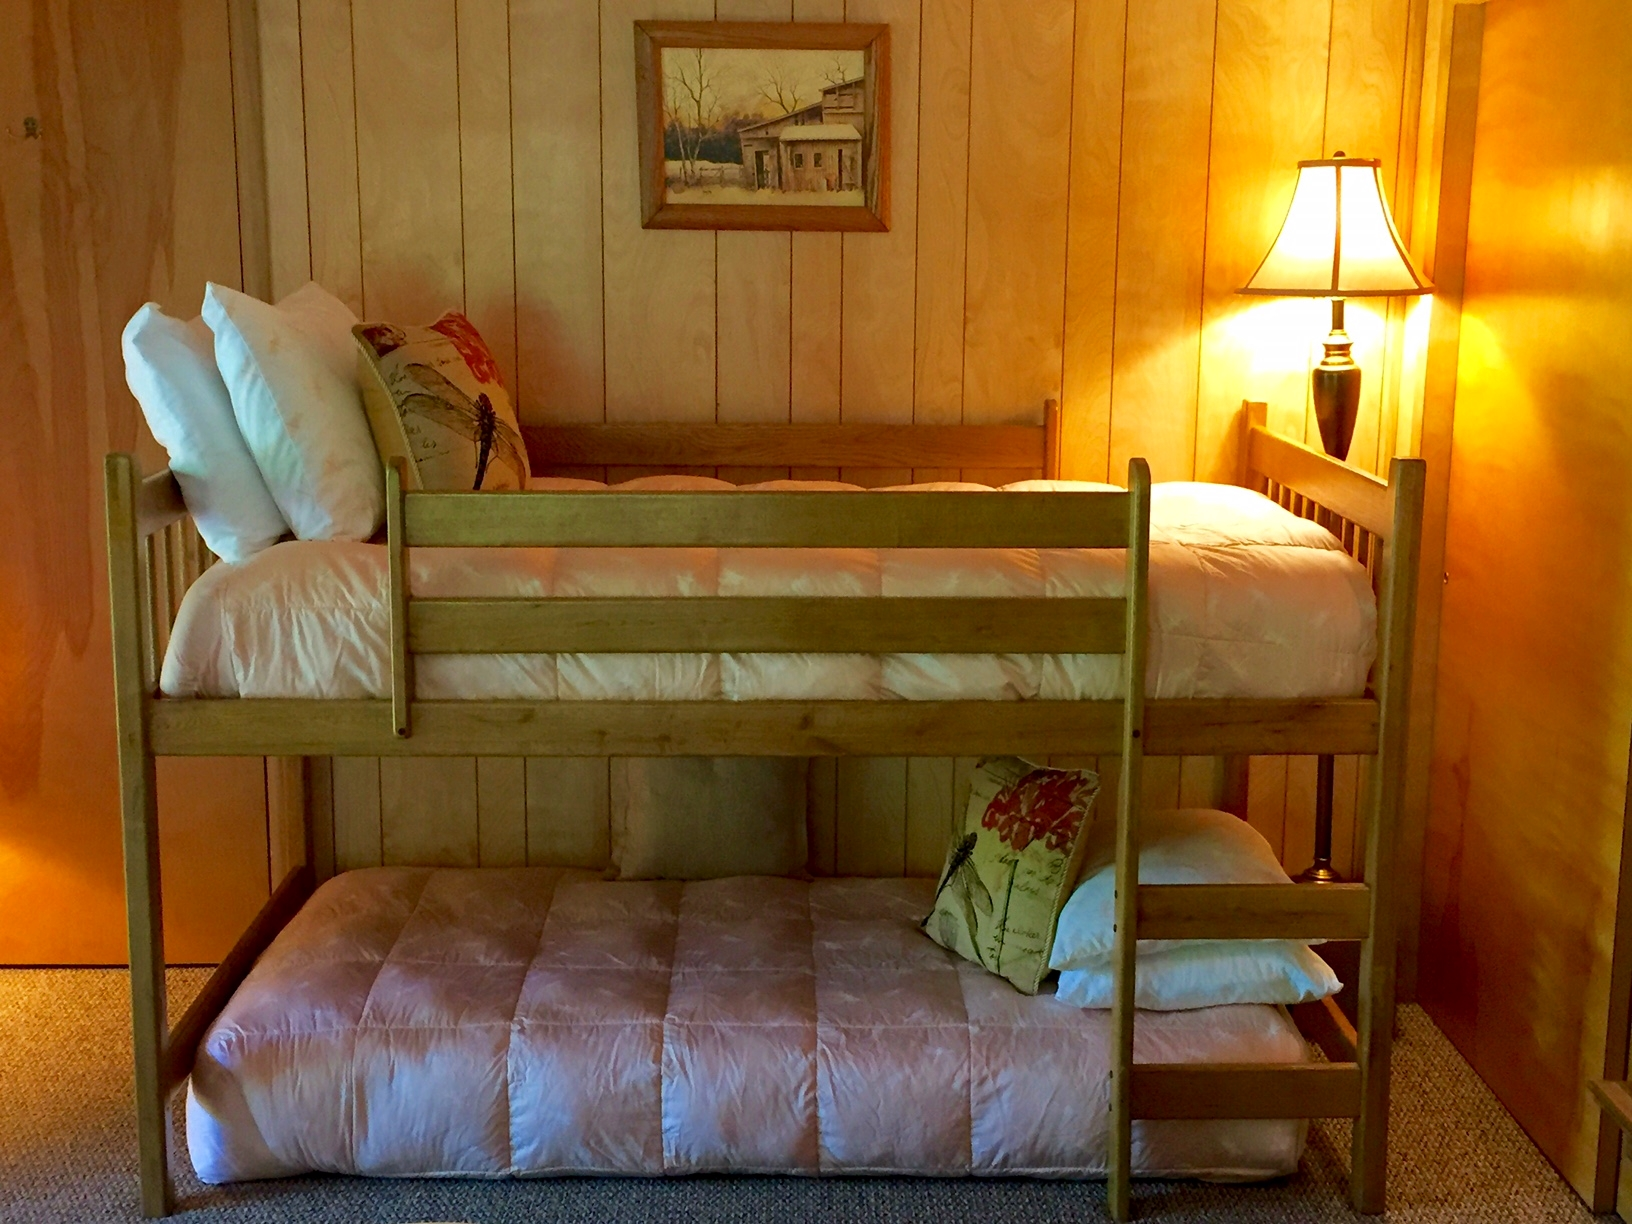 Downstairs Lake Bedroom Bunk Bed